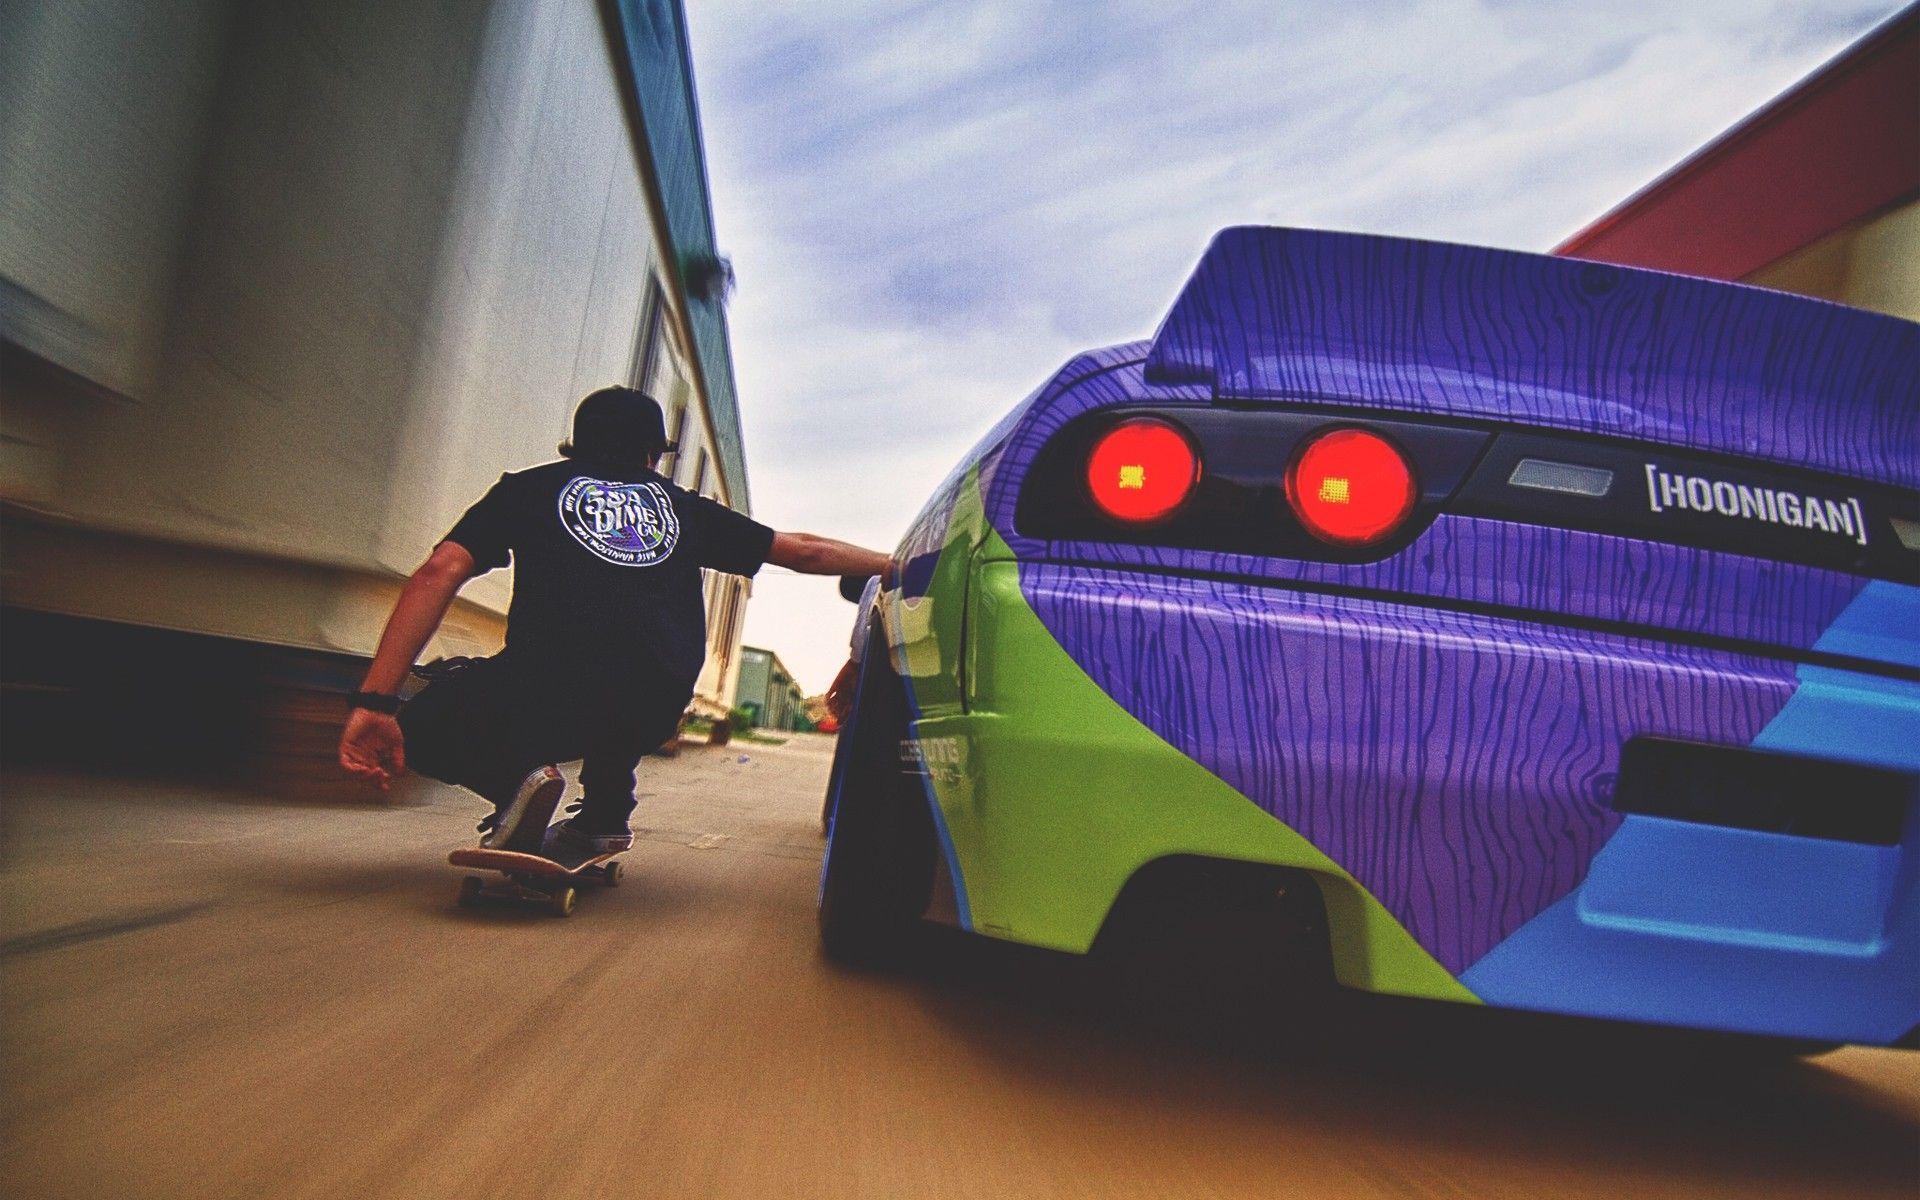 Skate board wallpapers wallpaper cave - Skateboard mobel ...